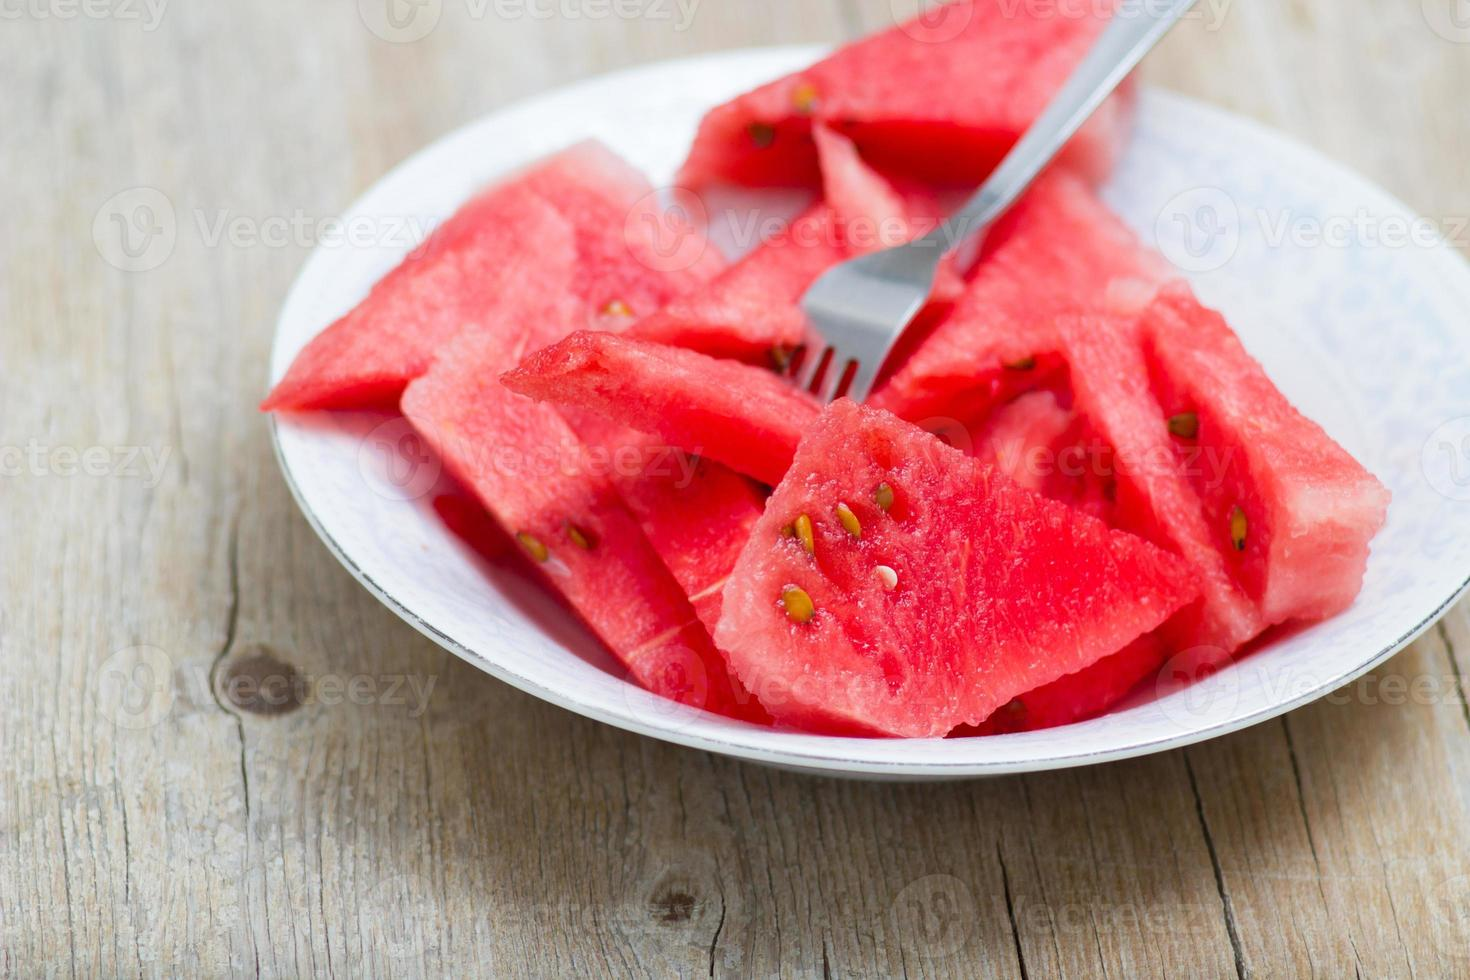 watermeloen segmenten in een bord foto